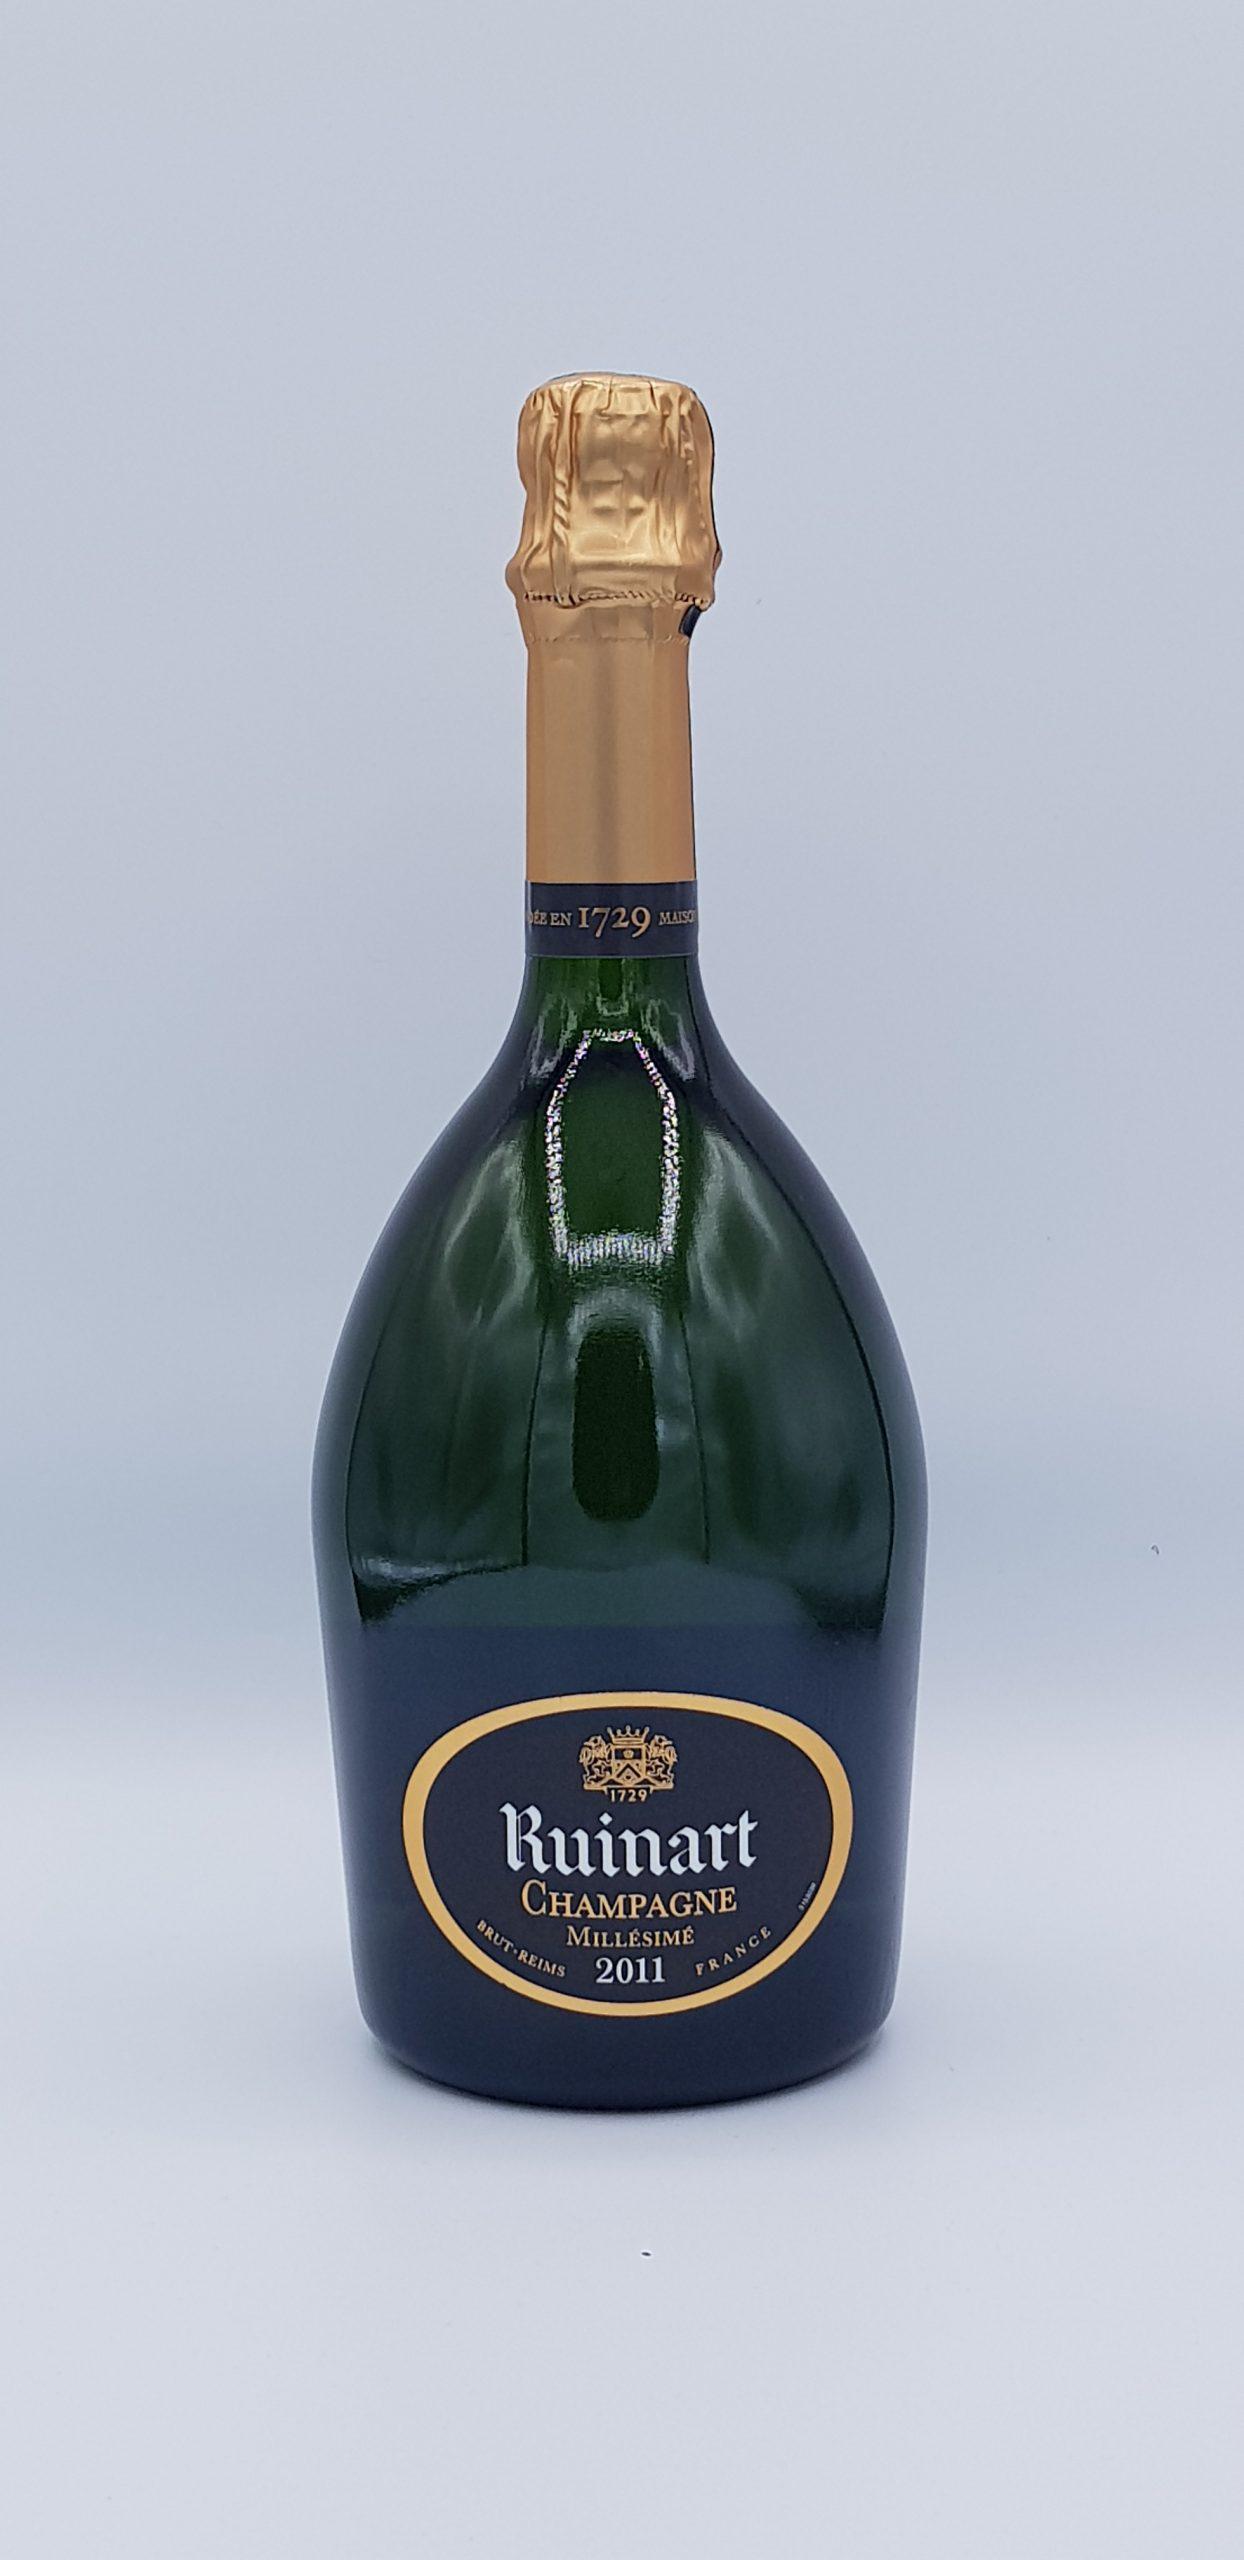 Champagne Ruinart Millesime 2010